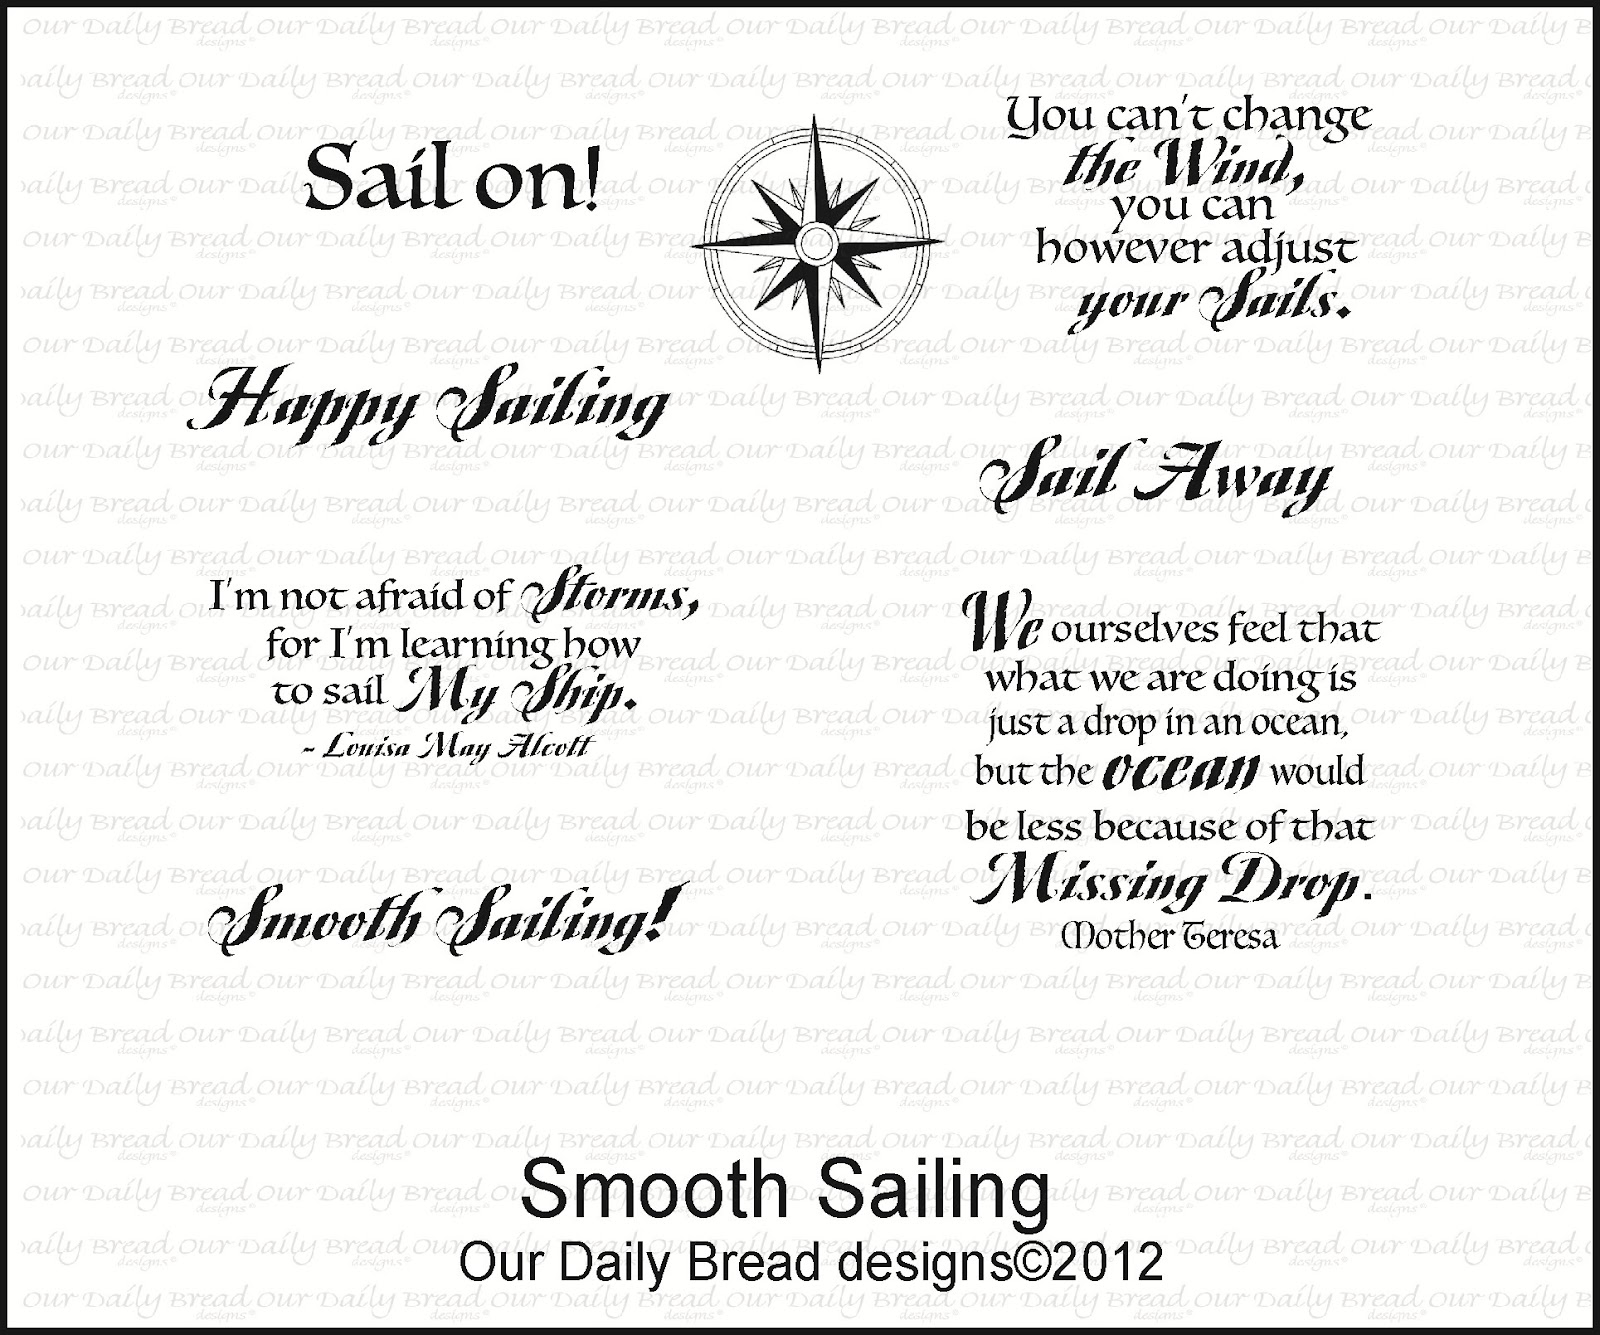 Inspirational Quotes Sailing: Sailing Quotes And Sayings. QuotesGram